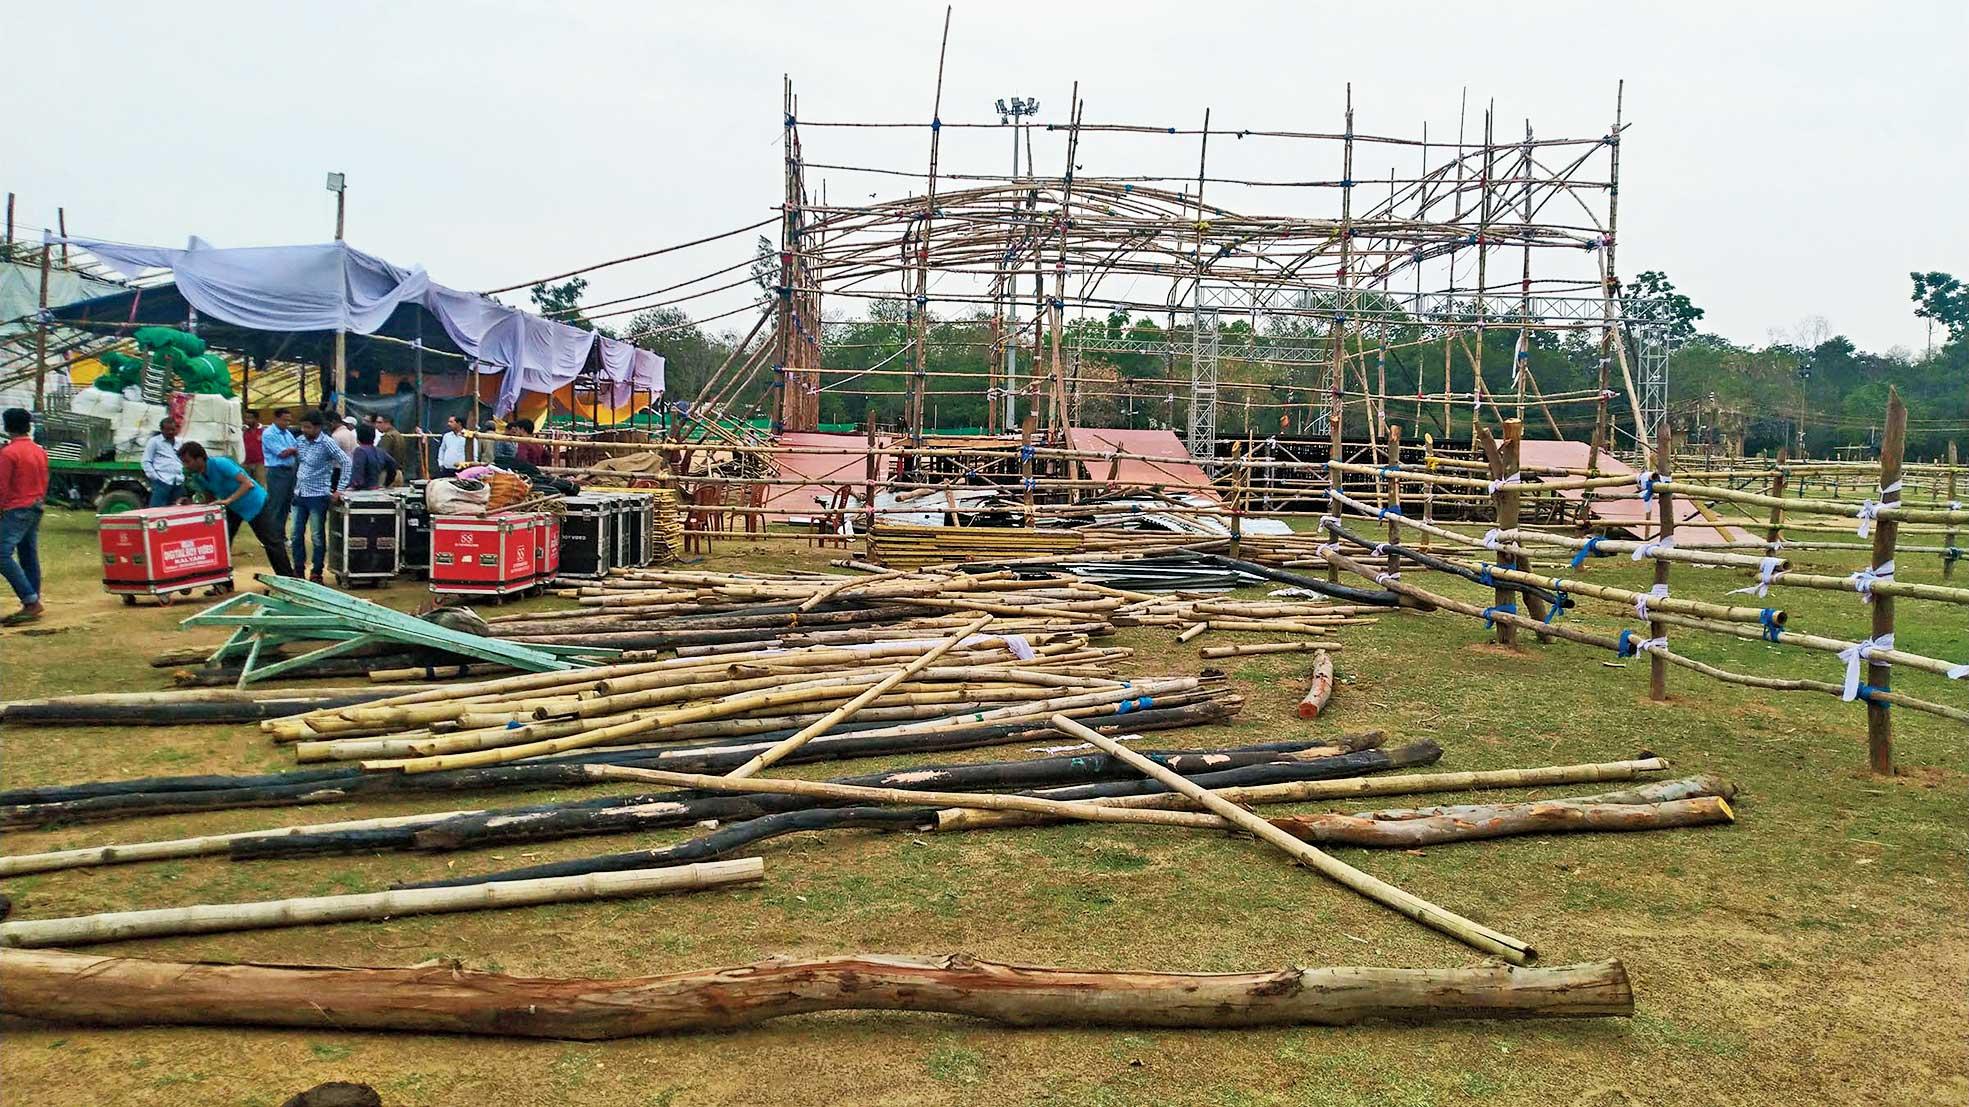 Basanta Utsav pandals being dismantled on Saturday.